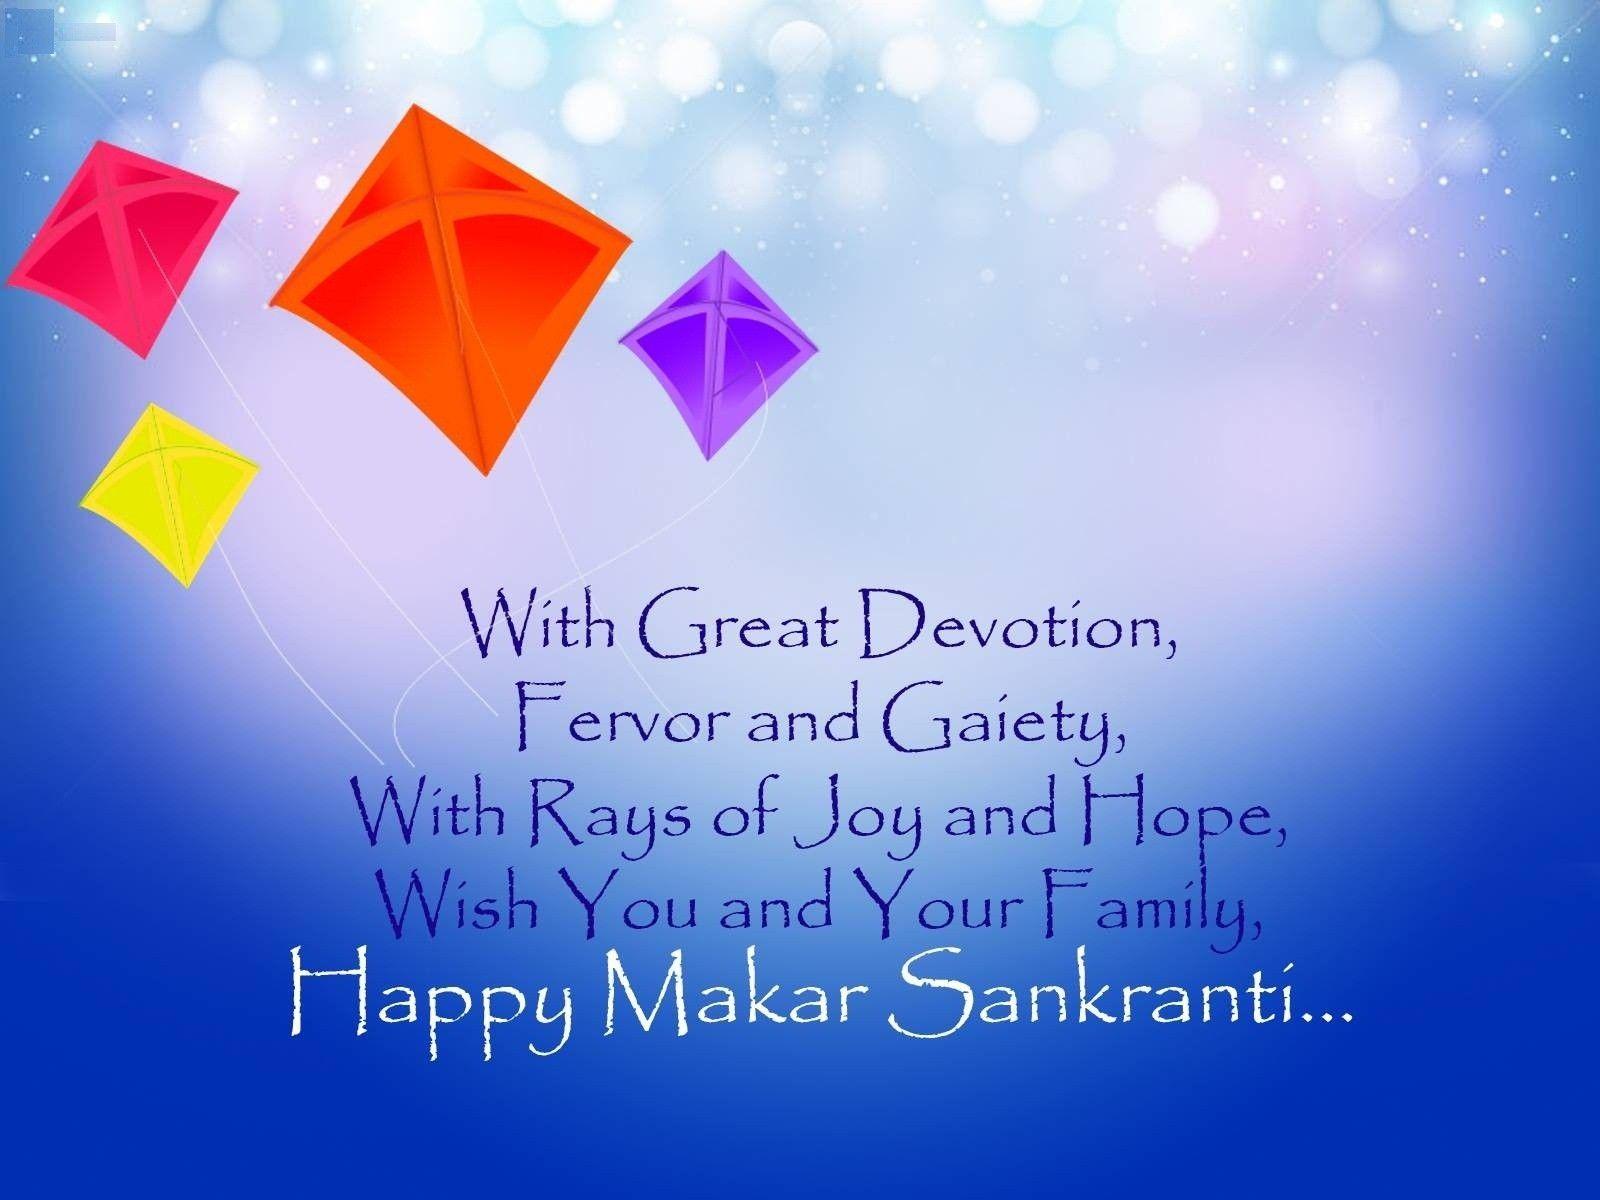 Happy Makar Sankranti Whatsapp Status And Messages Happy